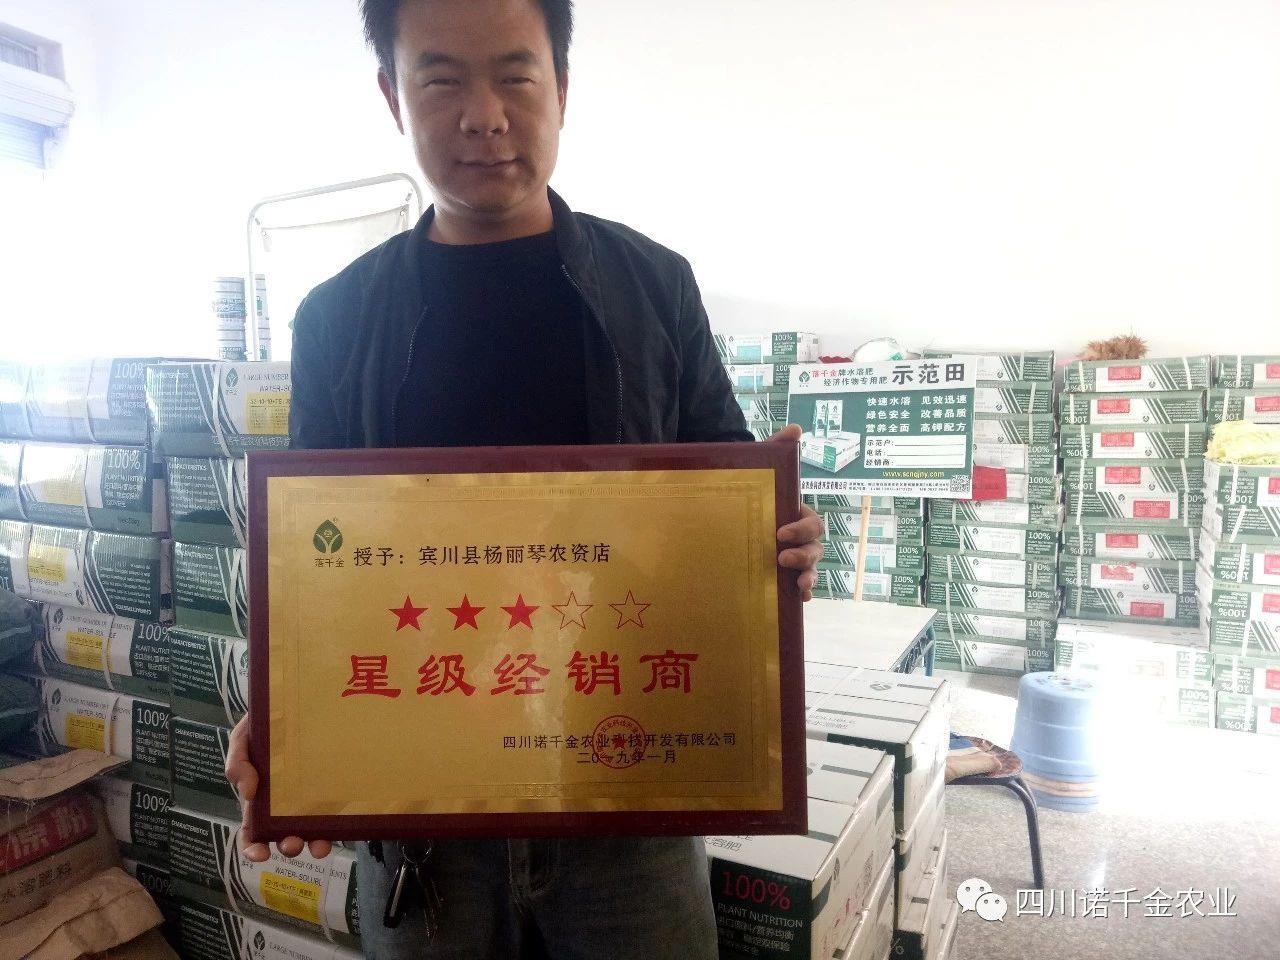 bwin肥 宣传 推广